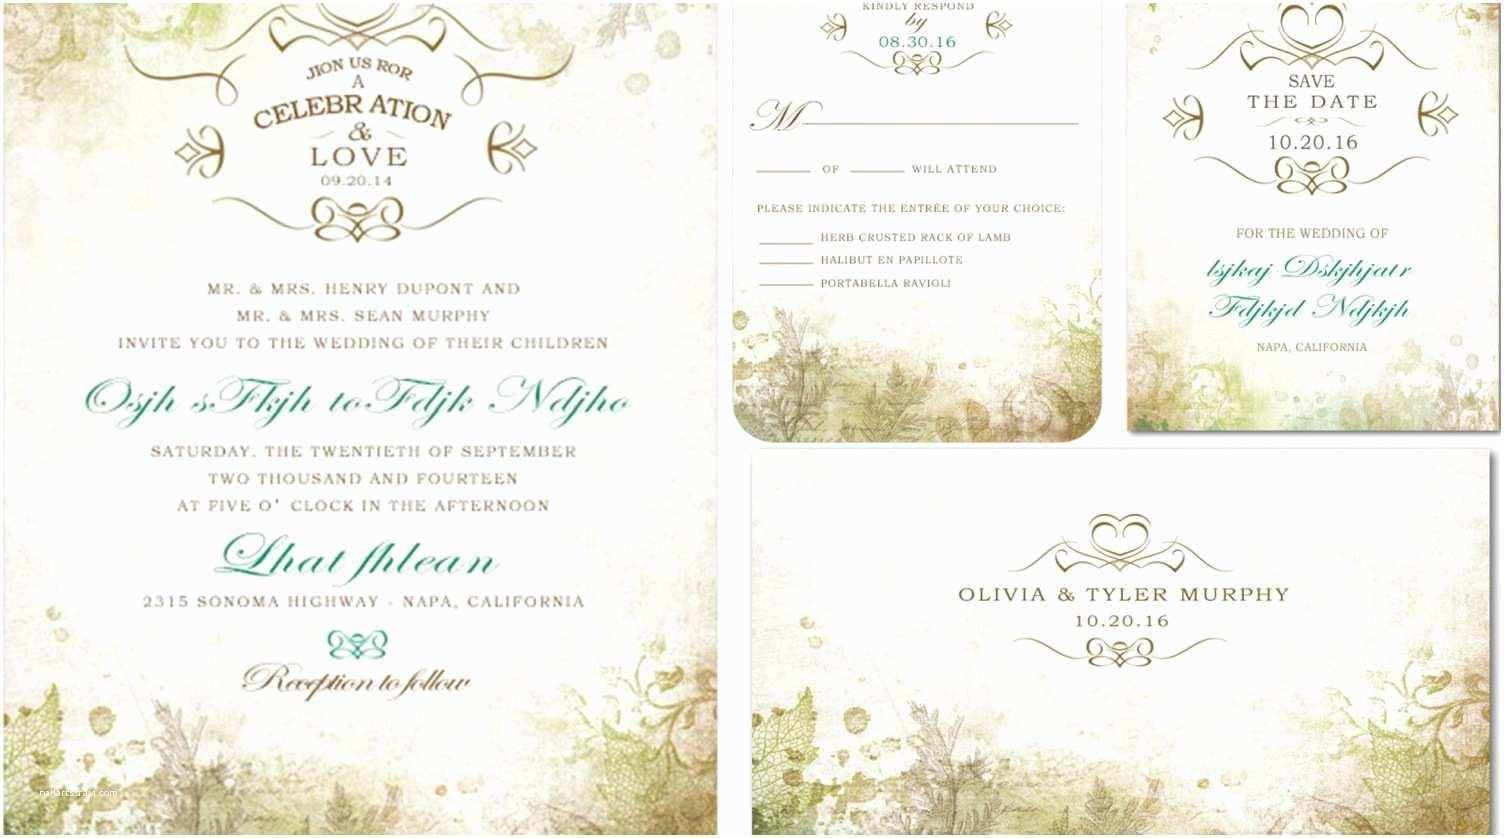 Cheap Wedding Invitations Ebay Wedding Invitation Kits Capable Cheap All In E Weddi